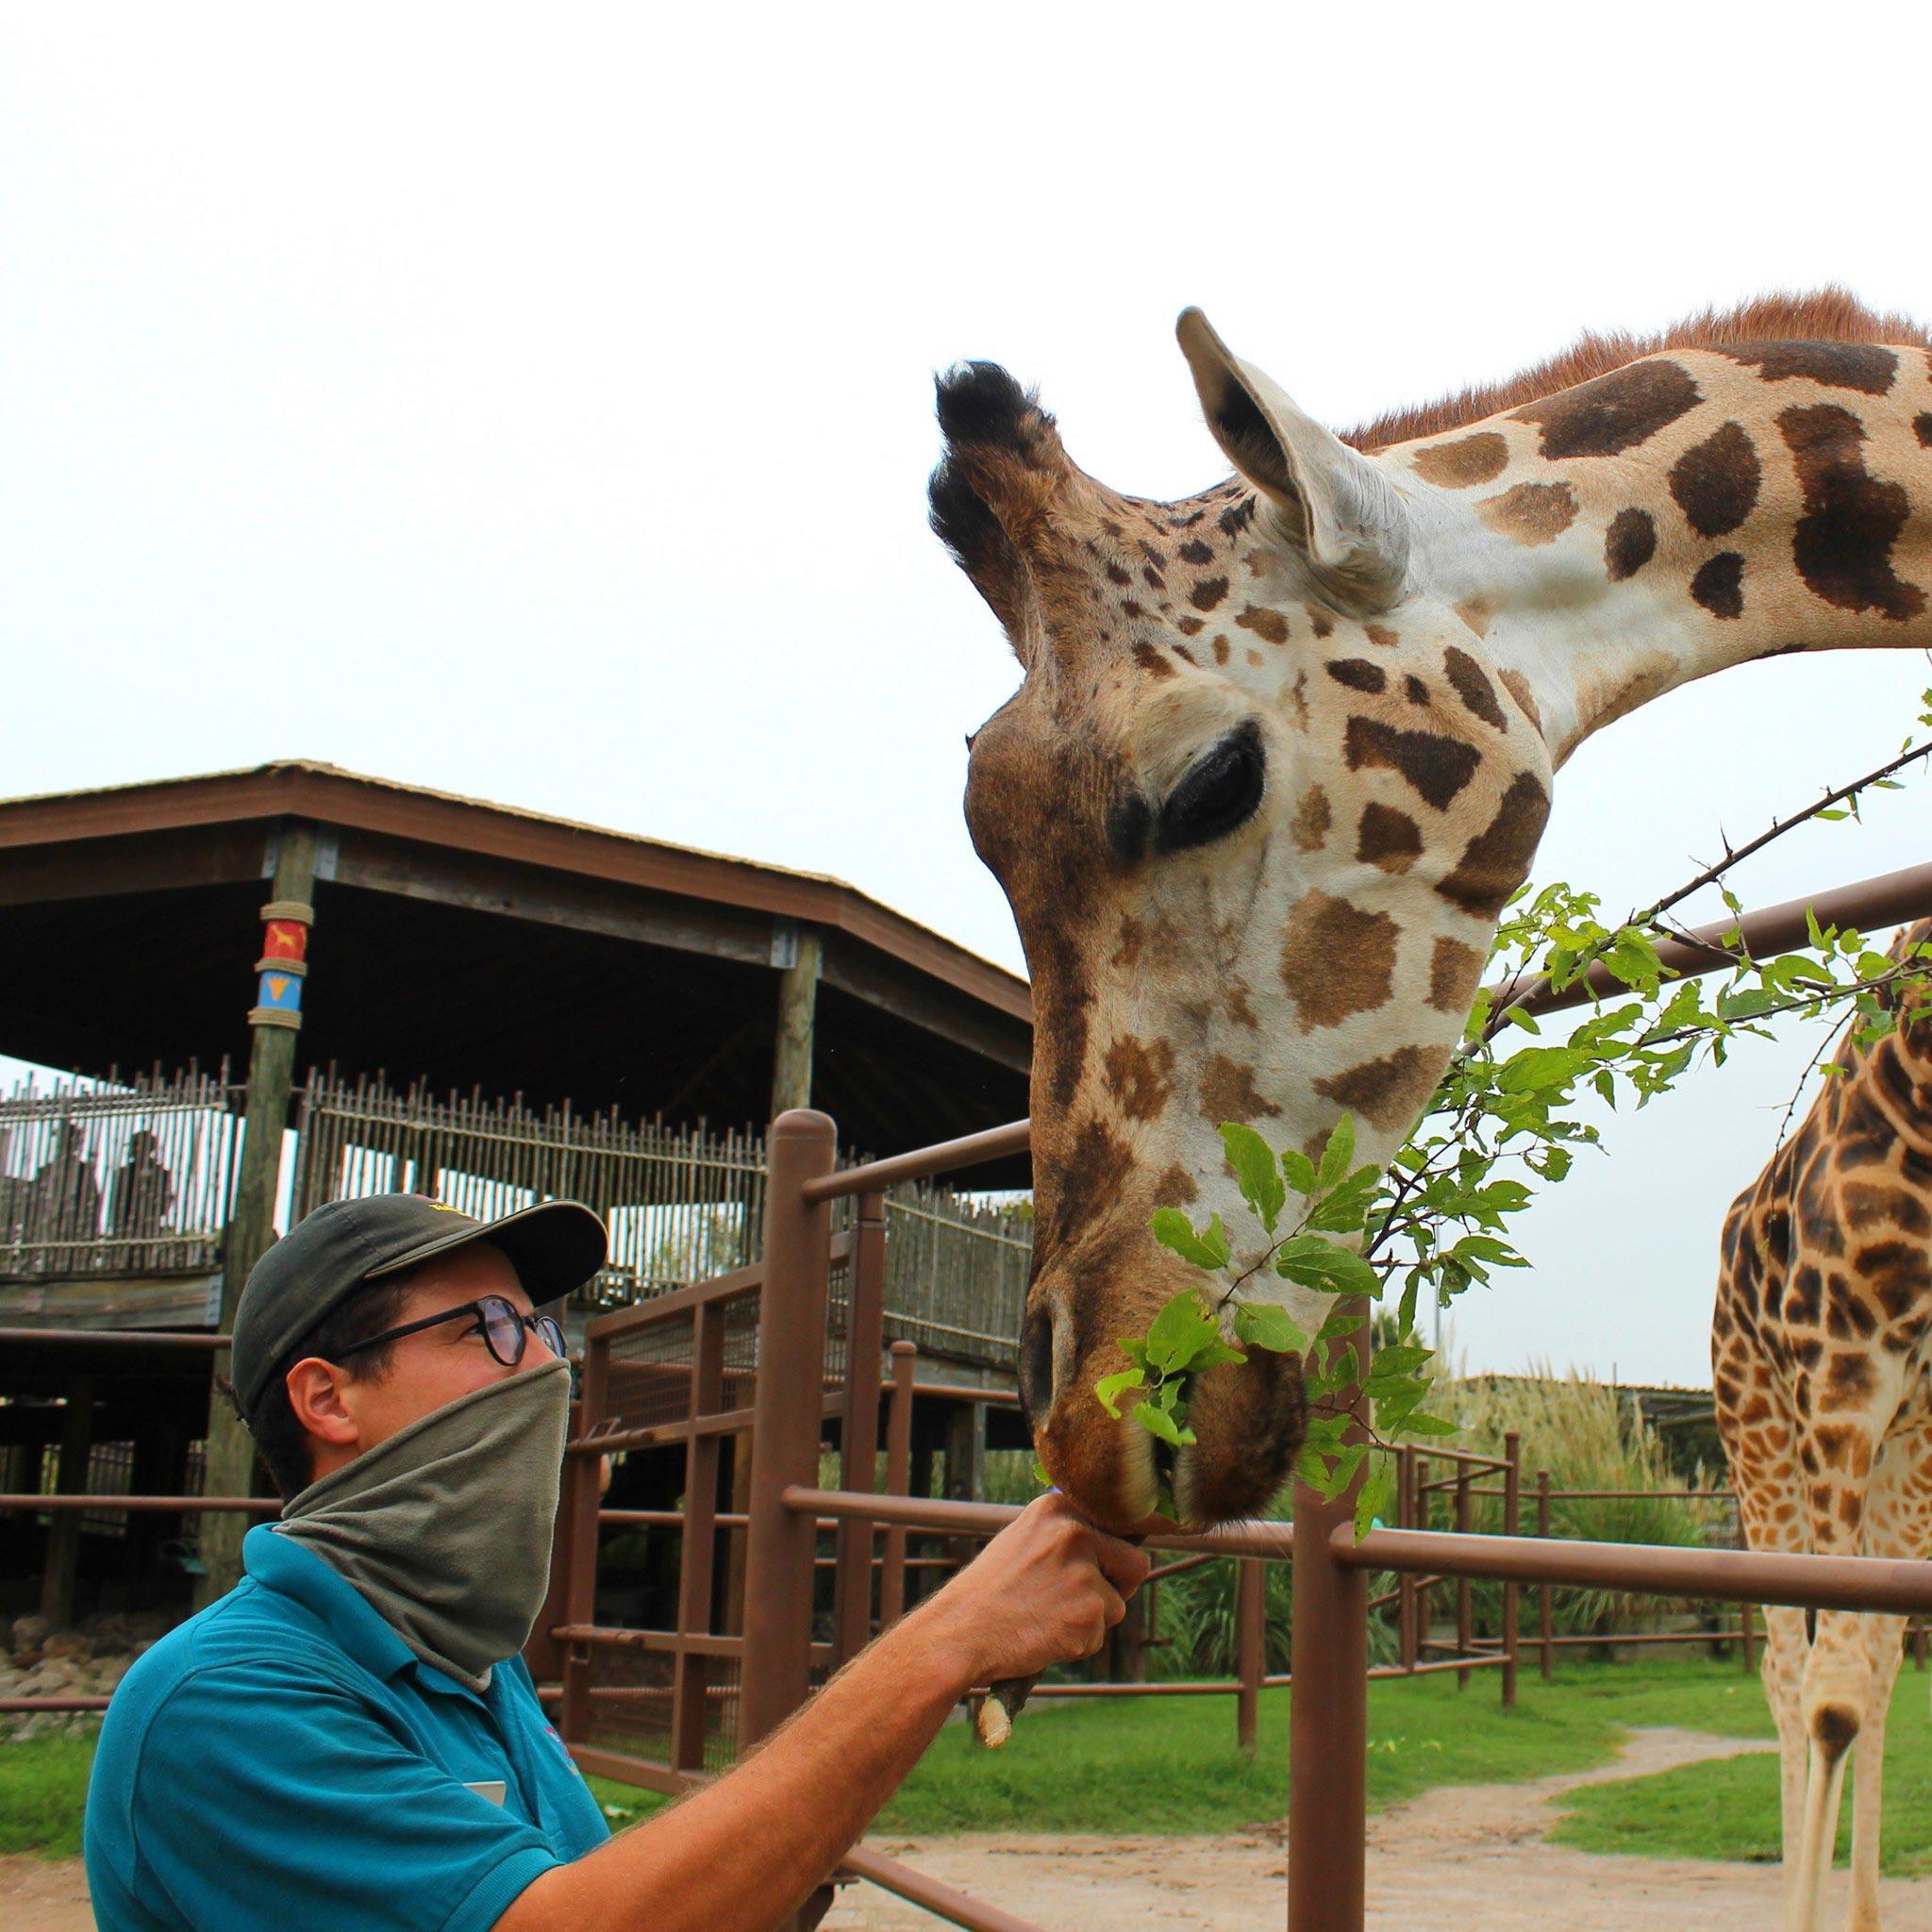 Tulsa Zoo giraffe feeding